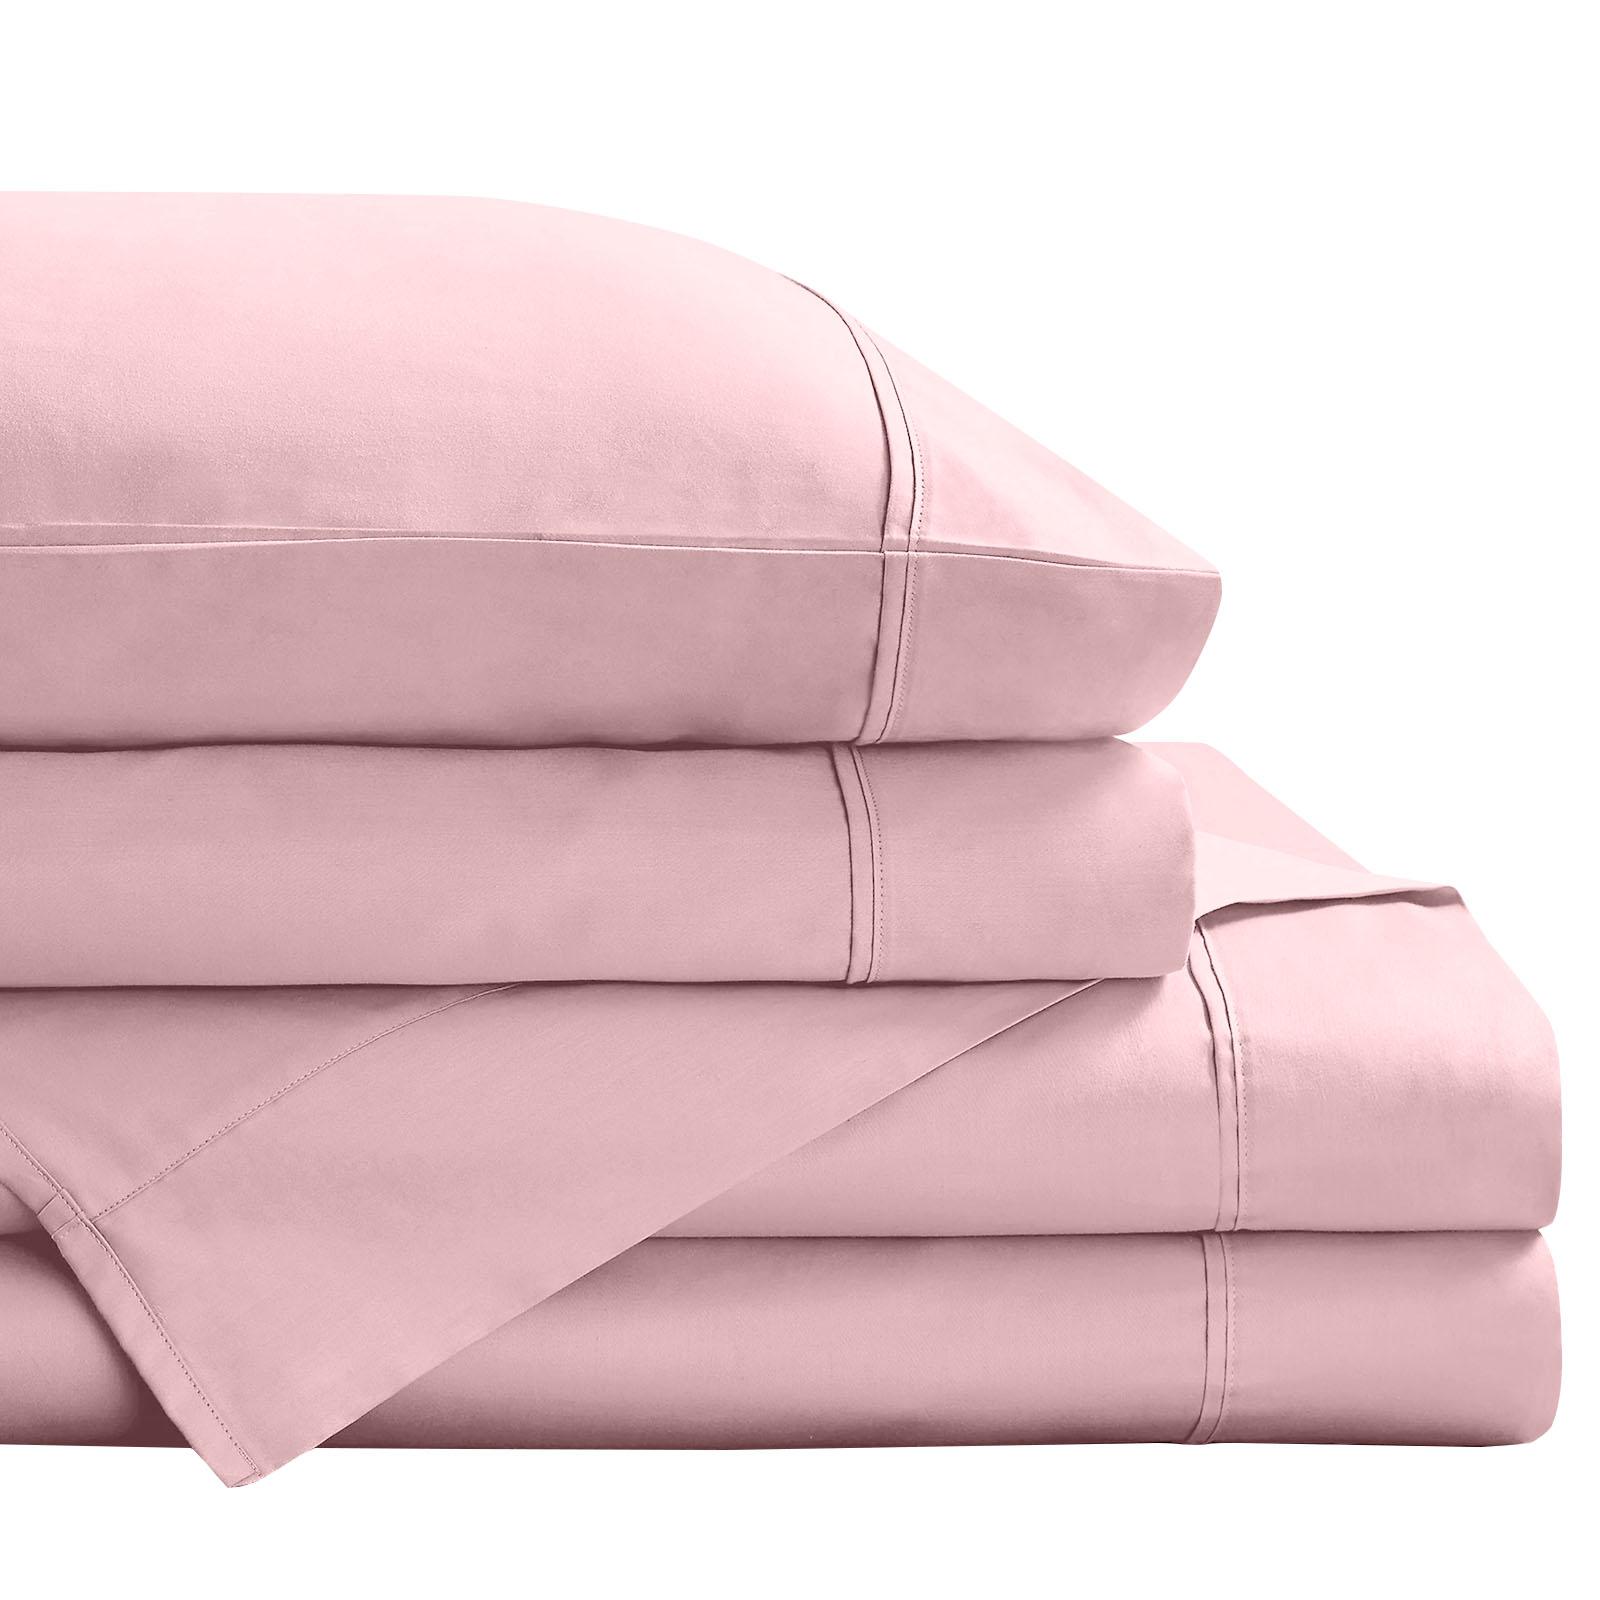 thumbnail 24 - Royal Comfort 1000TC Hotel Grade Bamboo Cotton Sheets Pillowcases Set Ultrasoft